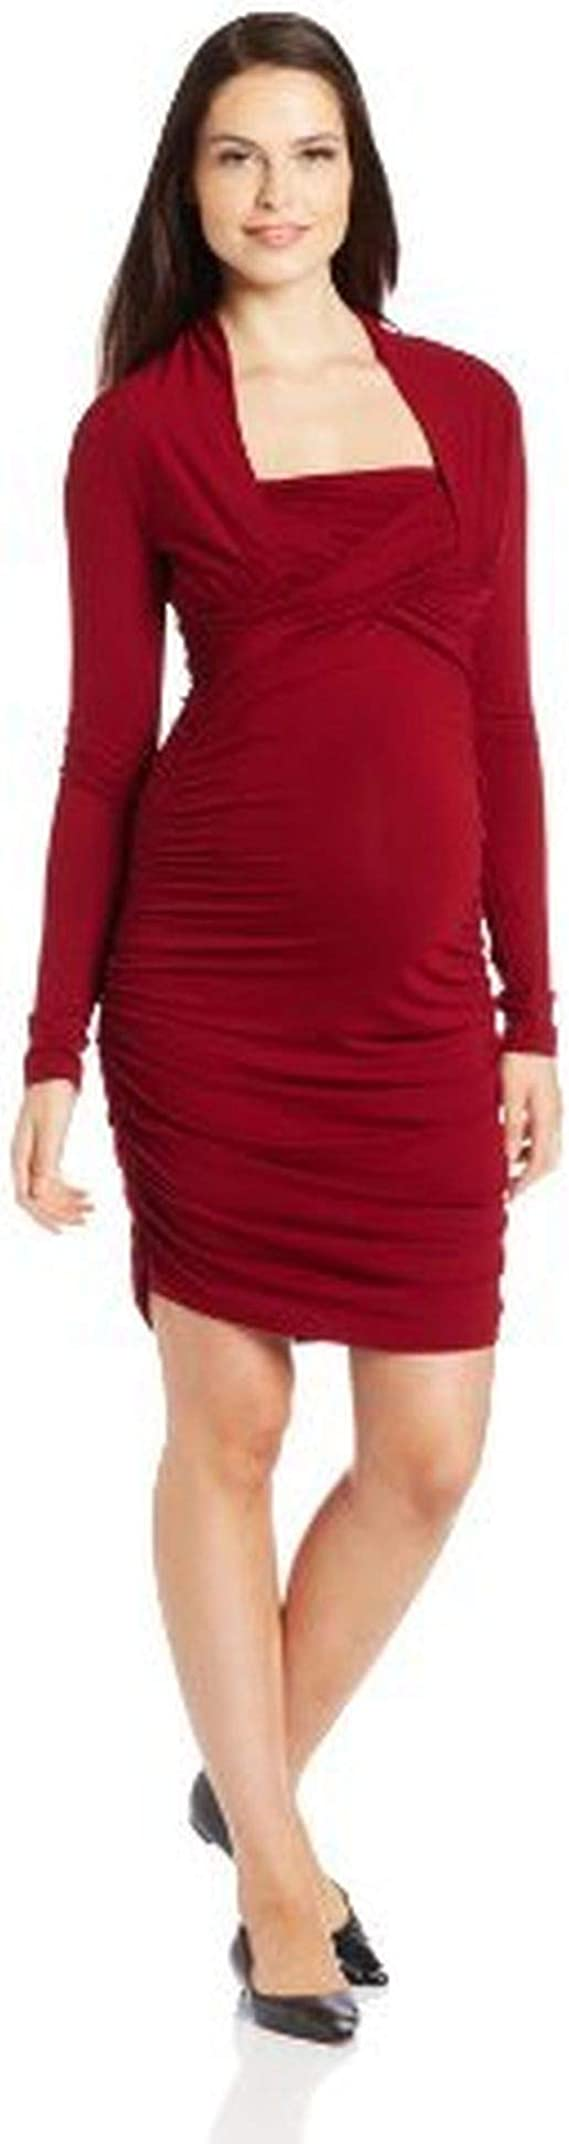 Ripe Maternity Women S Maternity Harper Nursing Dress Brick X Large At Amazon Women S Clothing Store